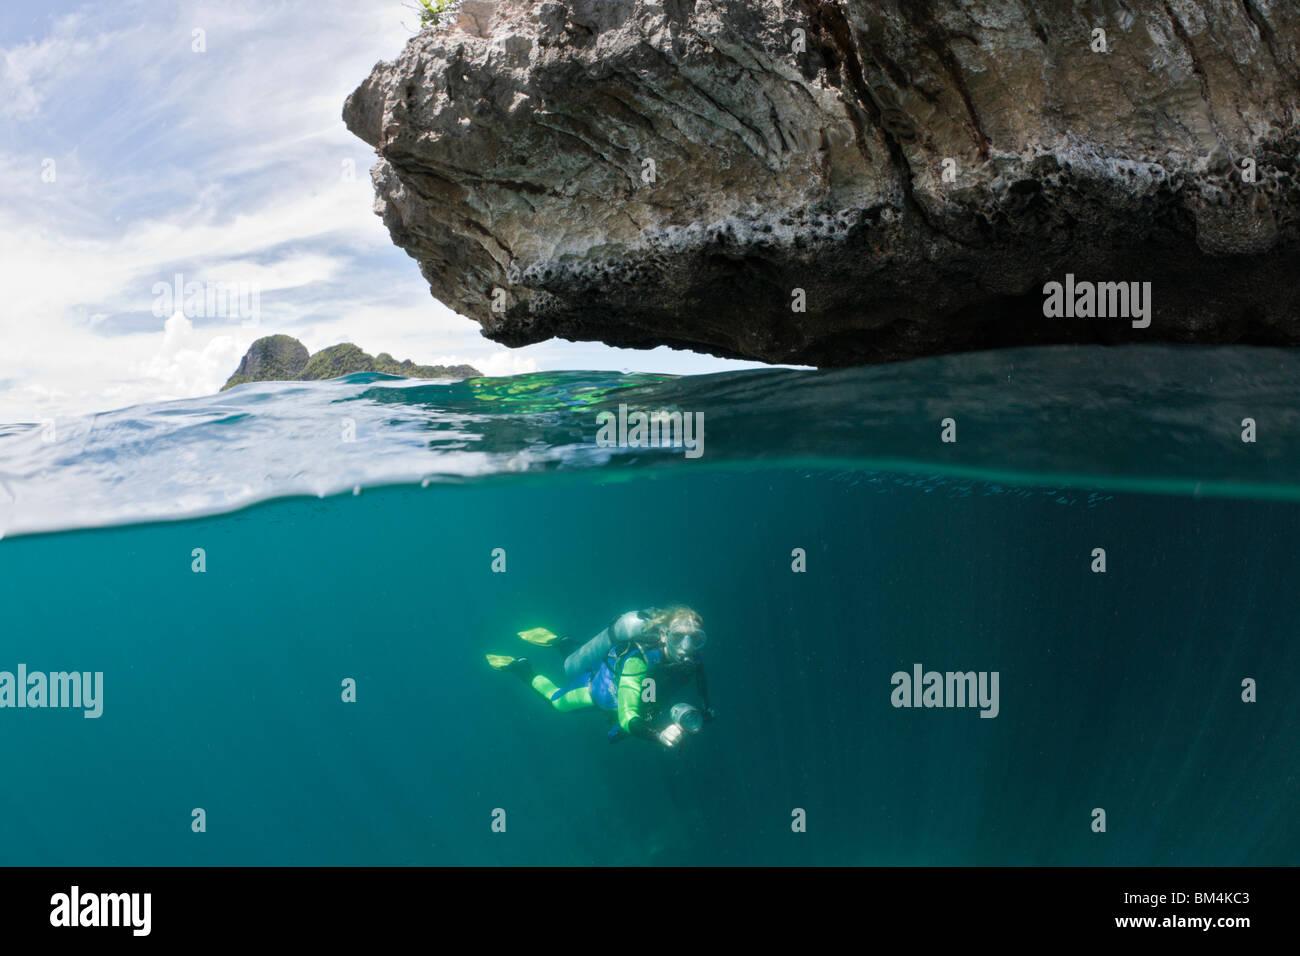 Buceo en aguas poco profundas, Raja Ampat, Papua Occidental, Indonesia Imagen De Stock